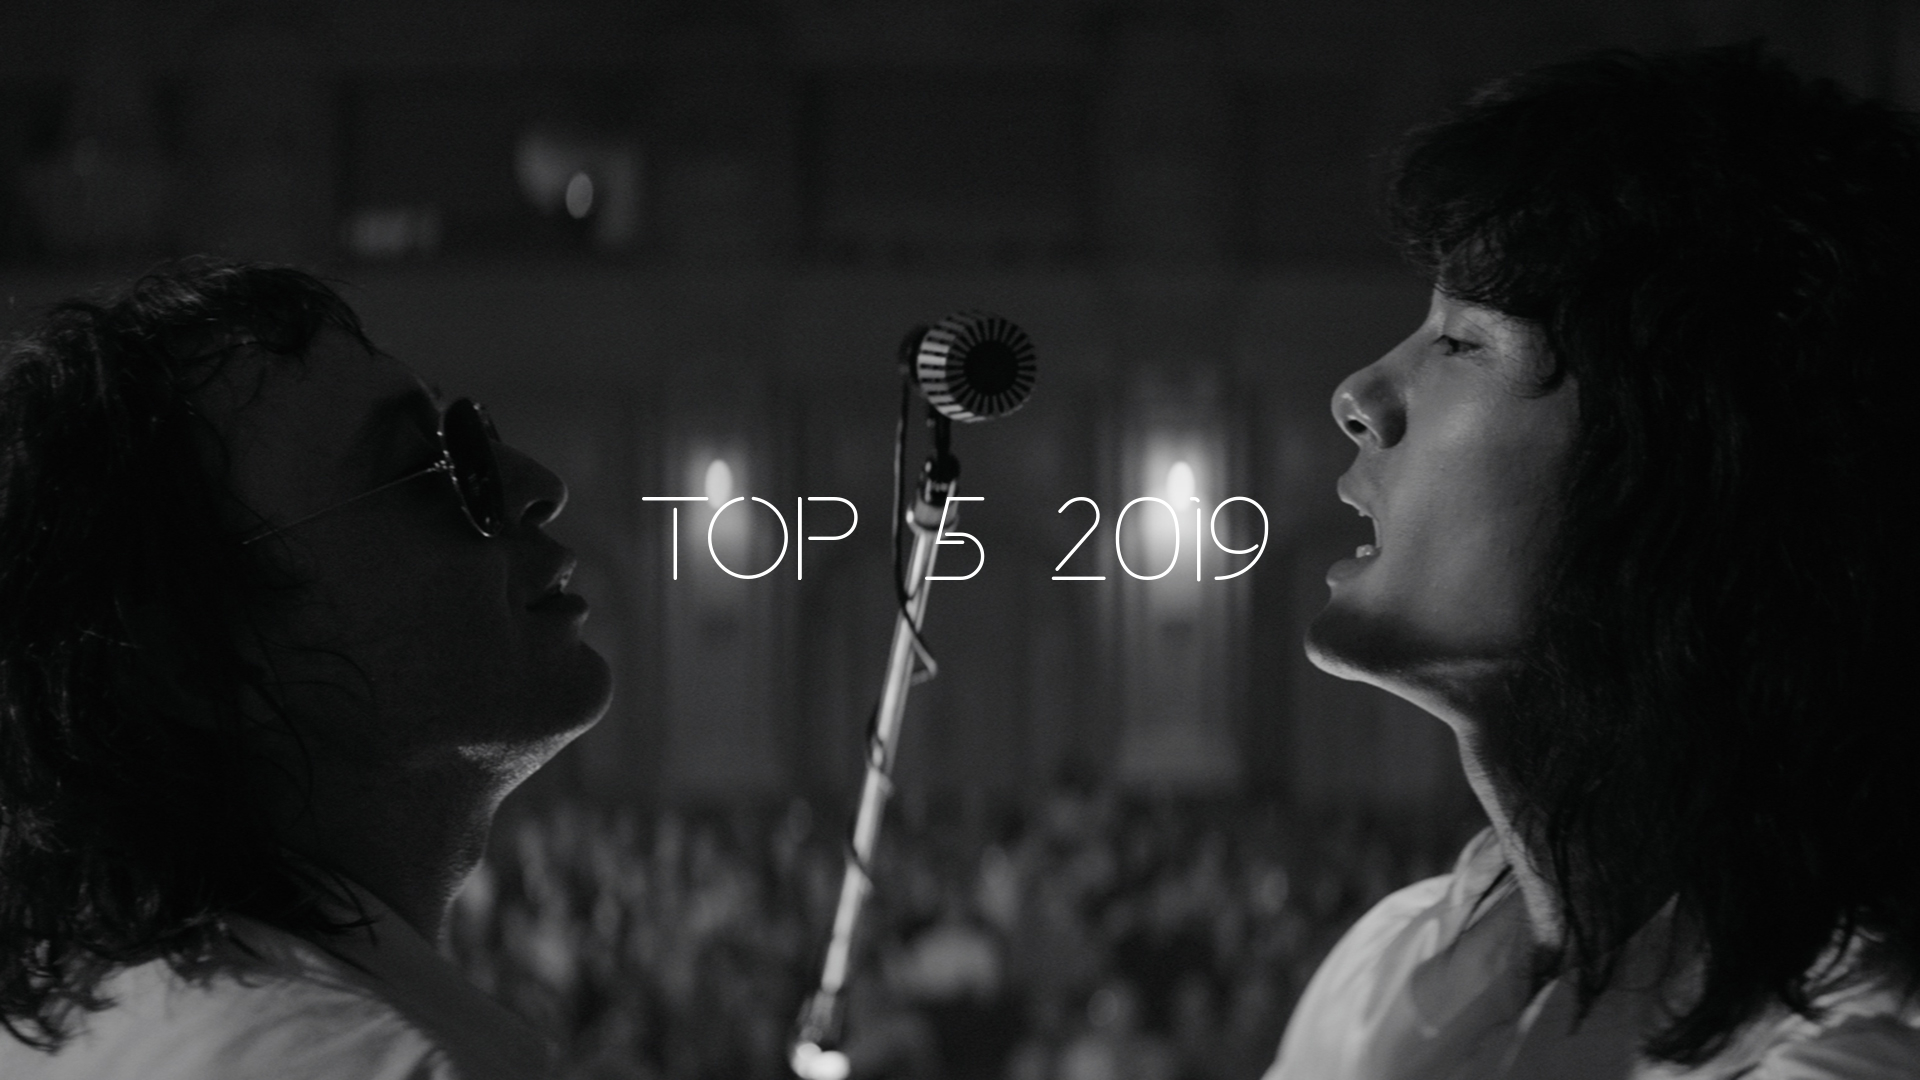 Cinema 2019: Fannie's Top 5